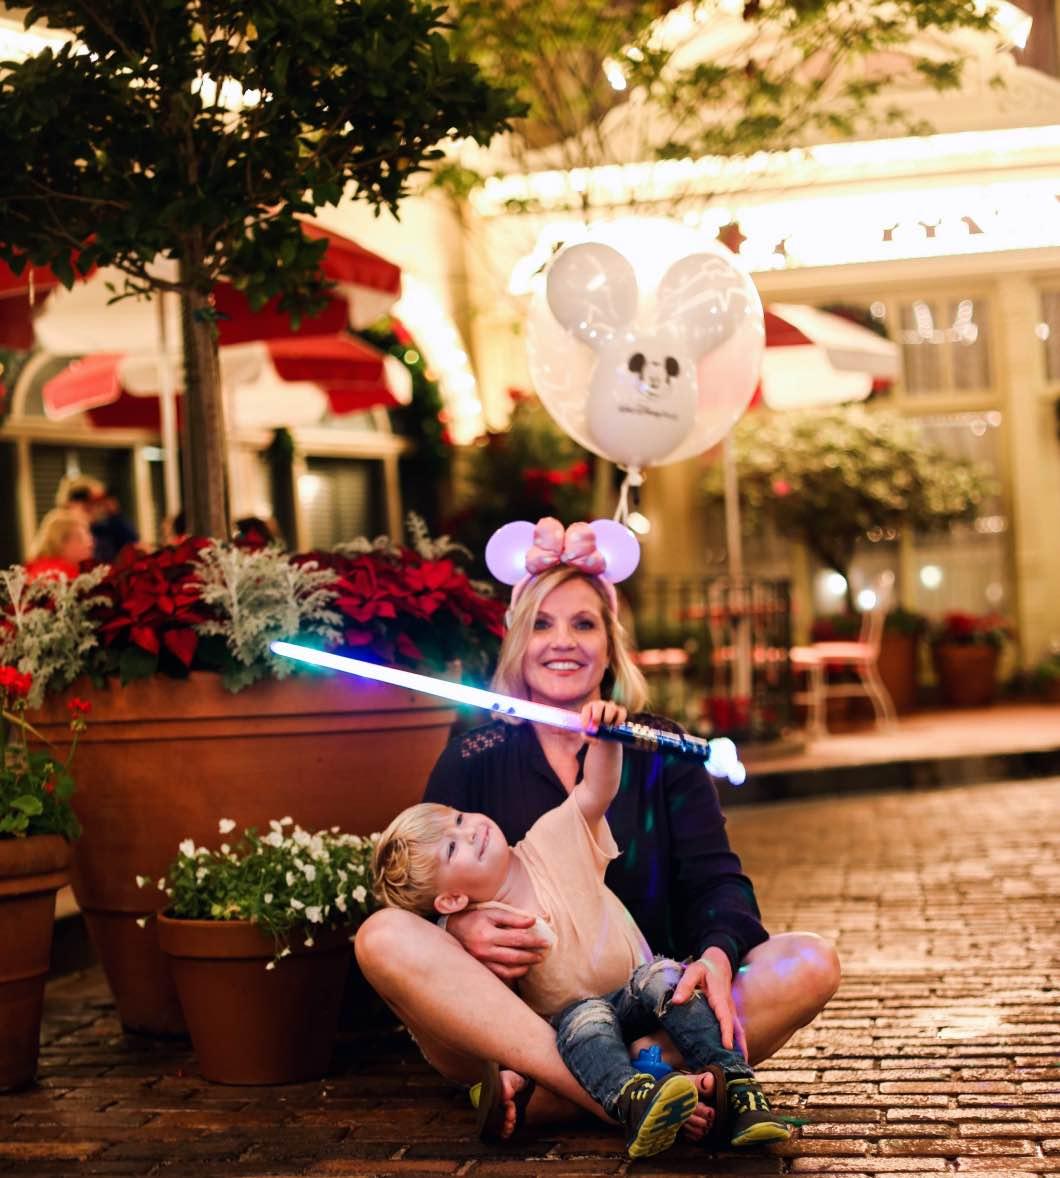 grandmaandtoddlermerrychristmasorlando - Holiday Attractions in Orlando by Atlanta travel blogger Happily Hughes